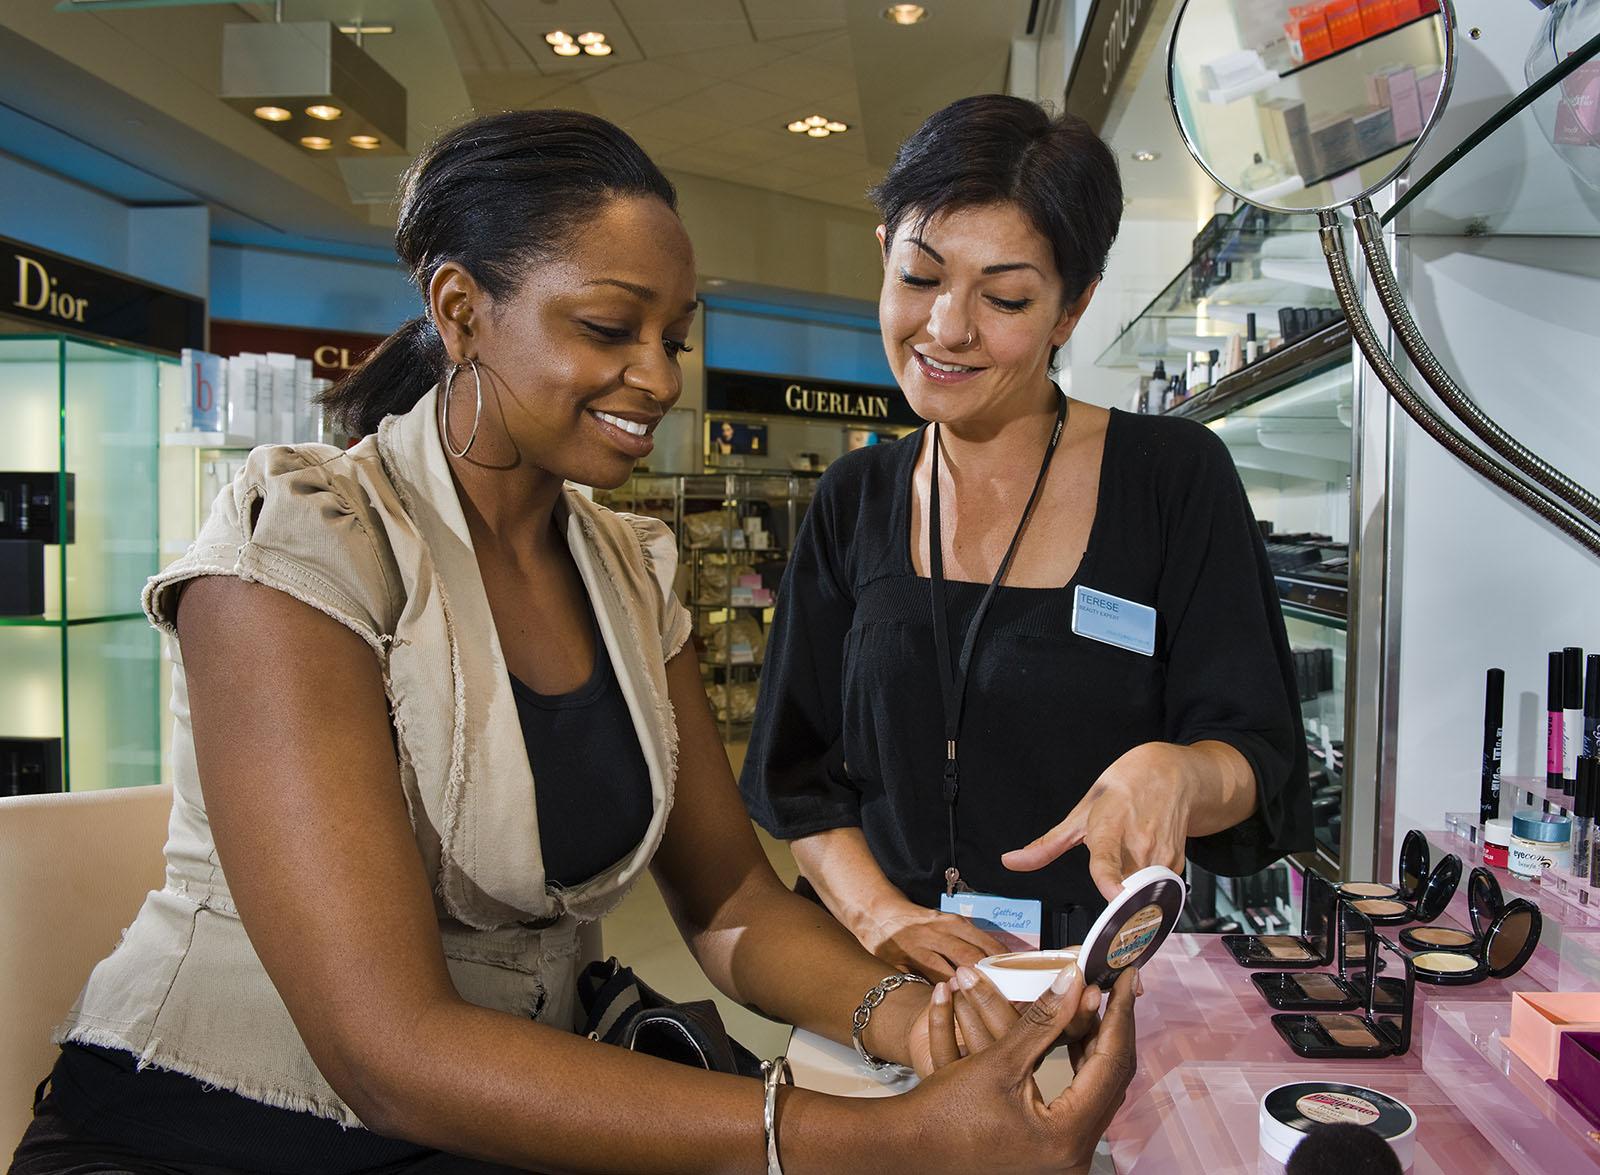 Cosmetic advisor at Shoppers Drugmart, Toronto